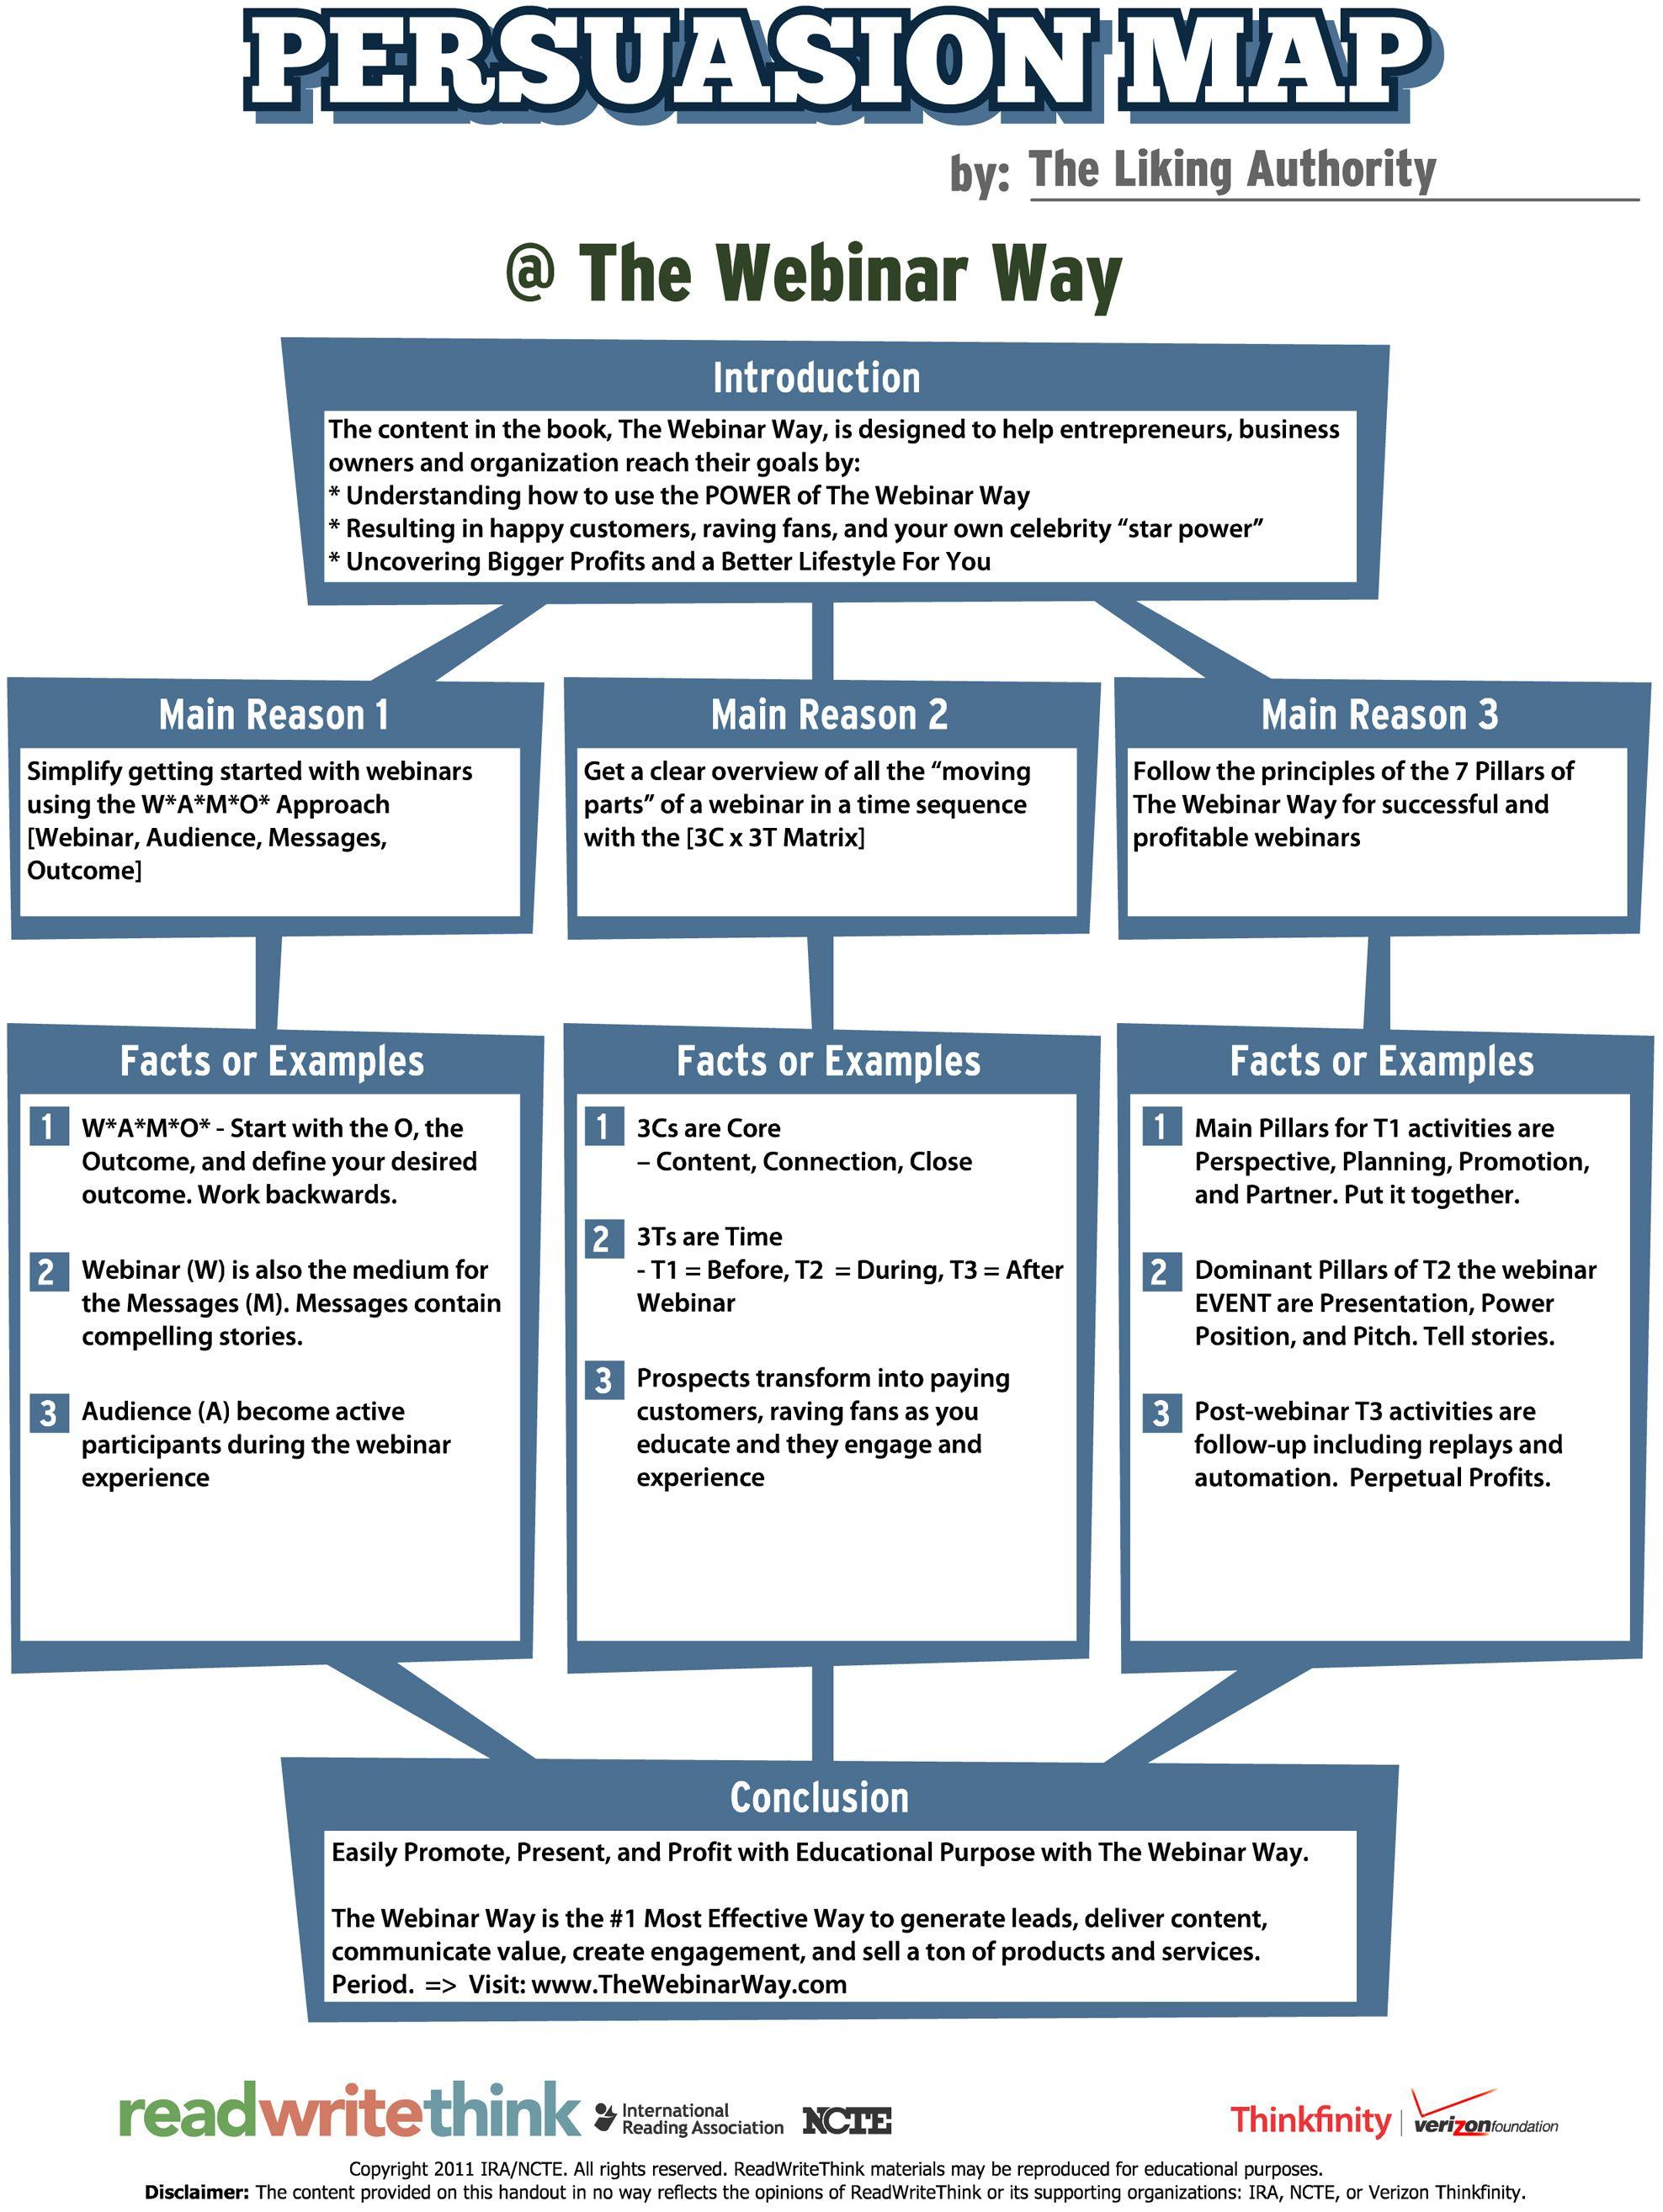 Persuasion Map Through Webinars Via Thewebinarway